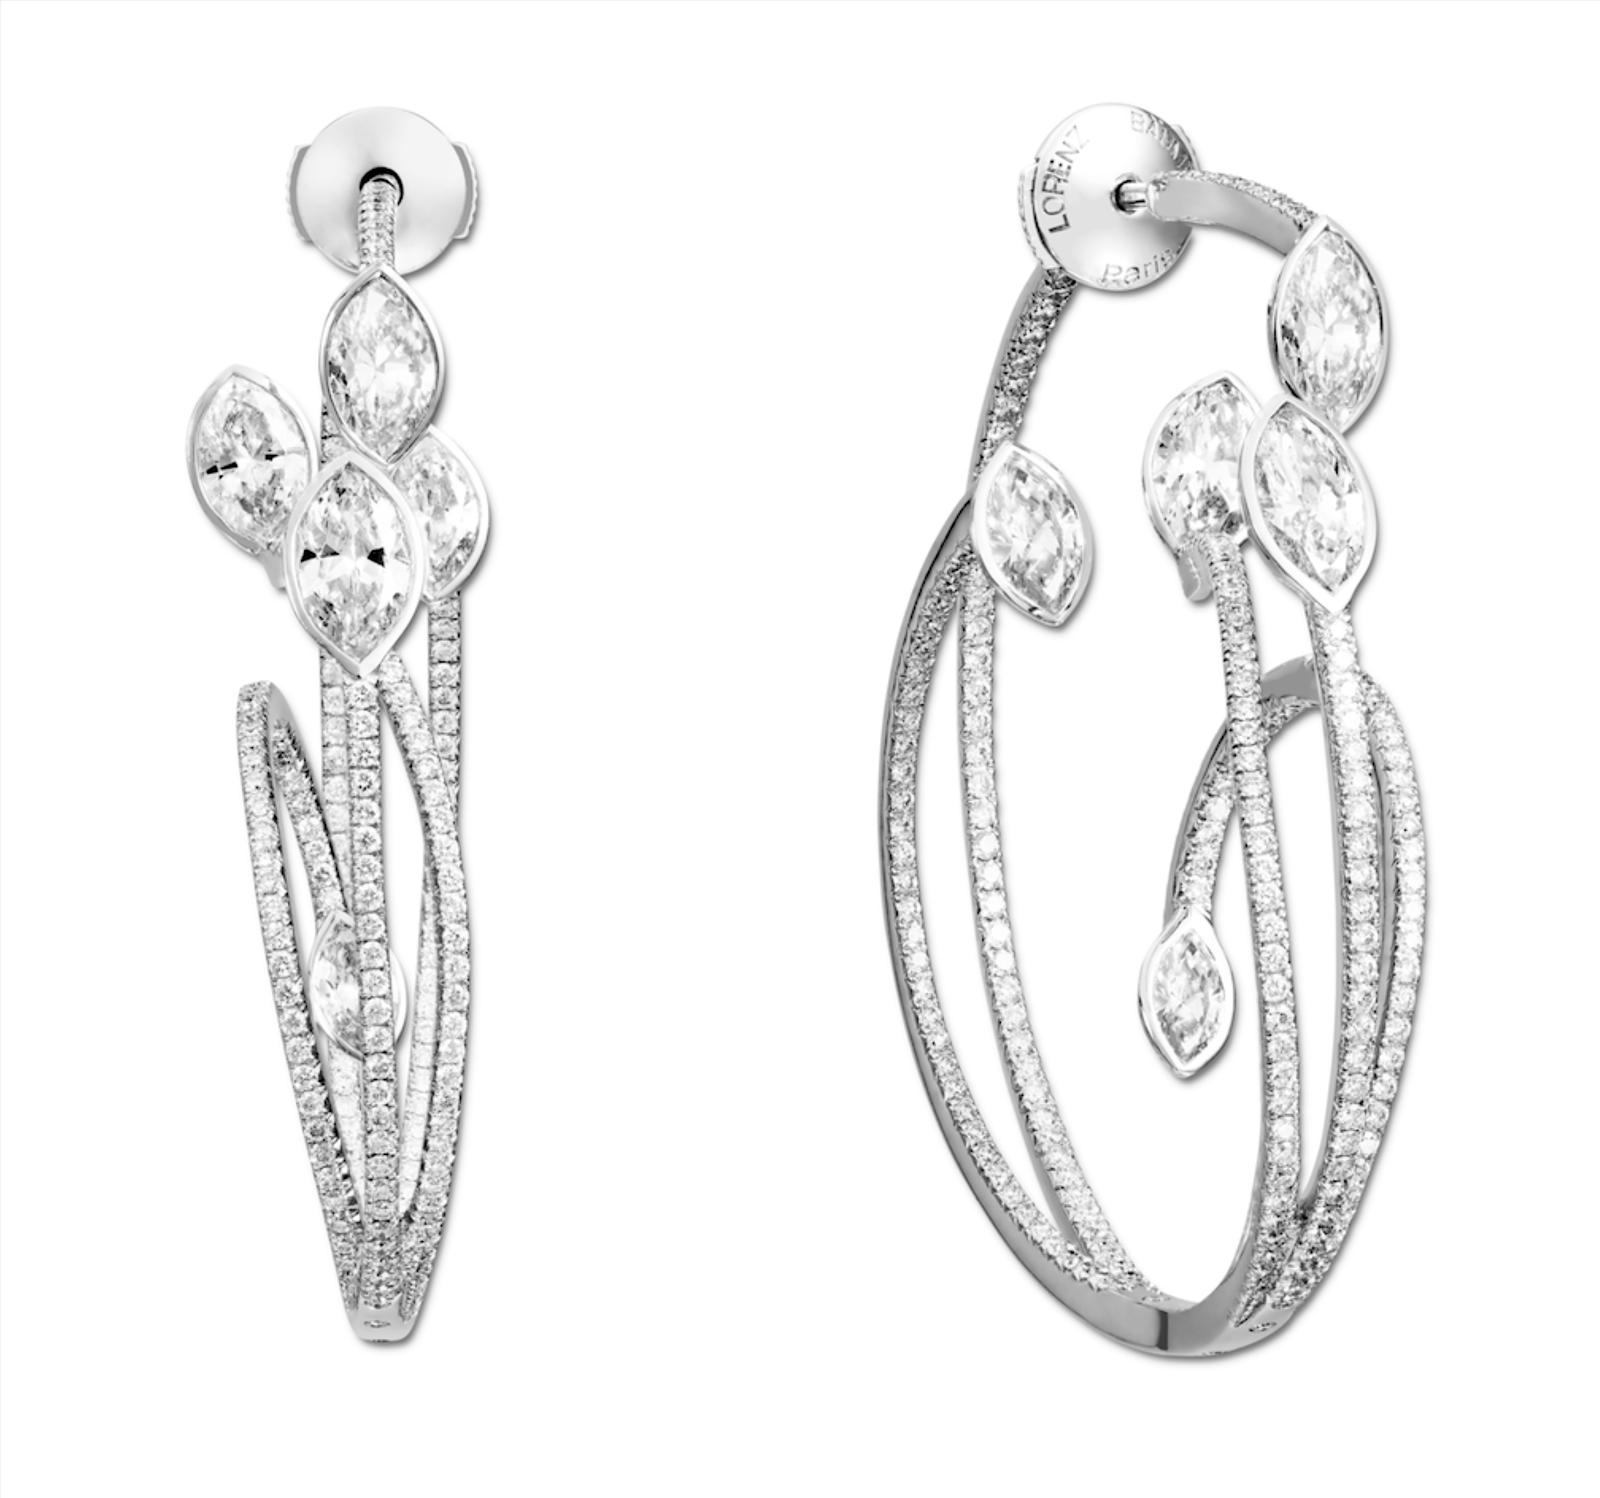 German Jewelry Designer in Paris